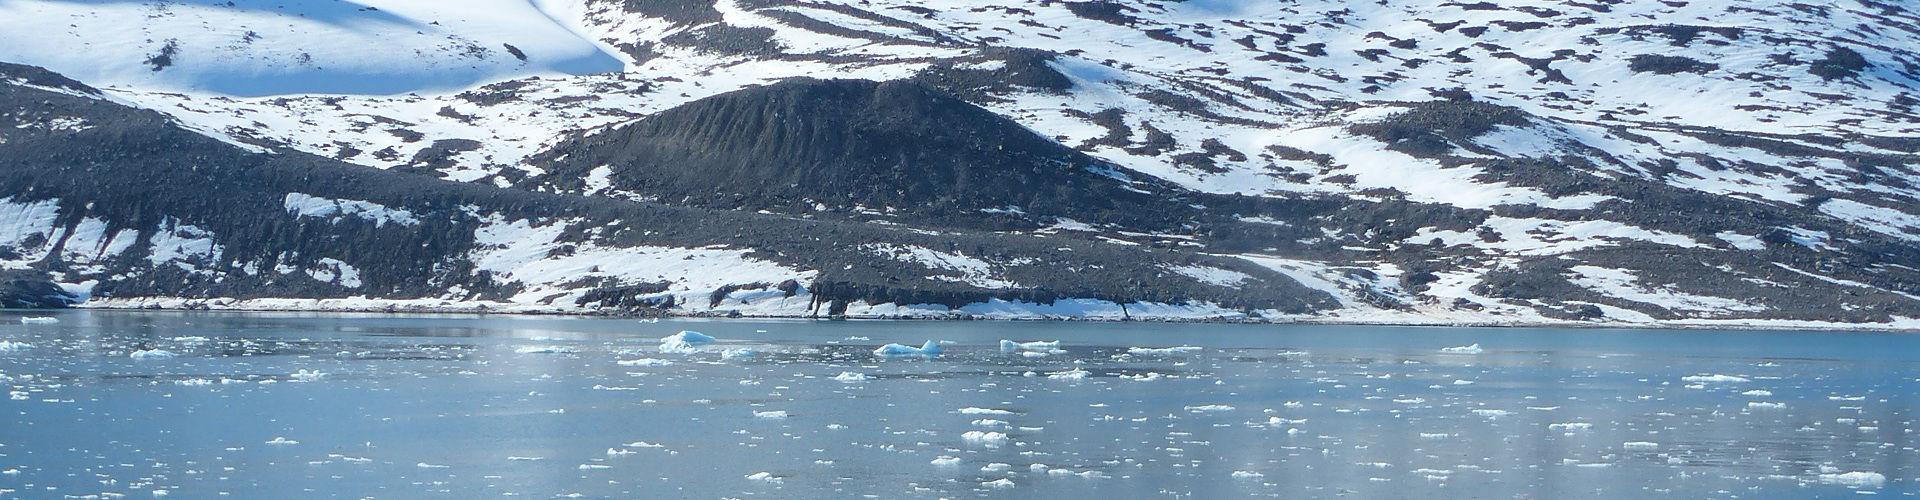 Foto resa till Spitsbergen